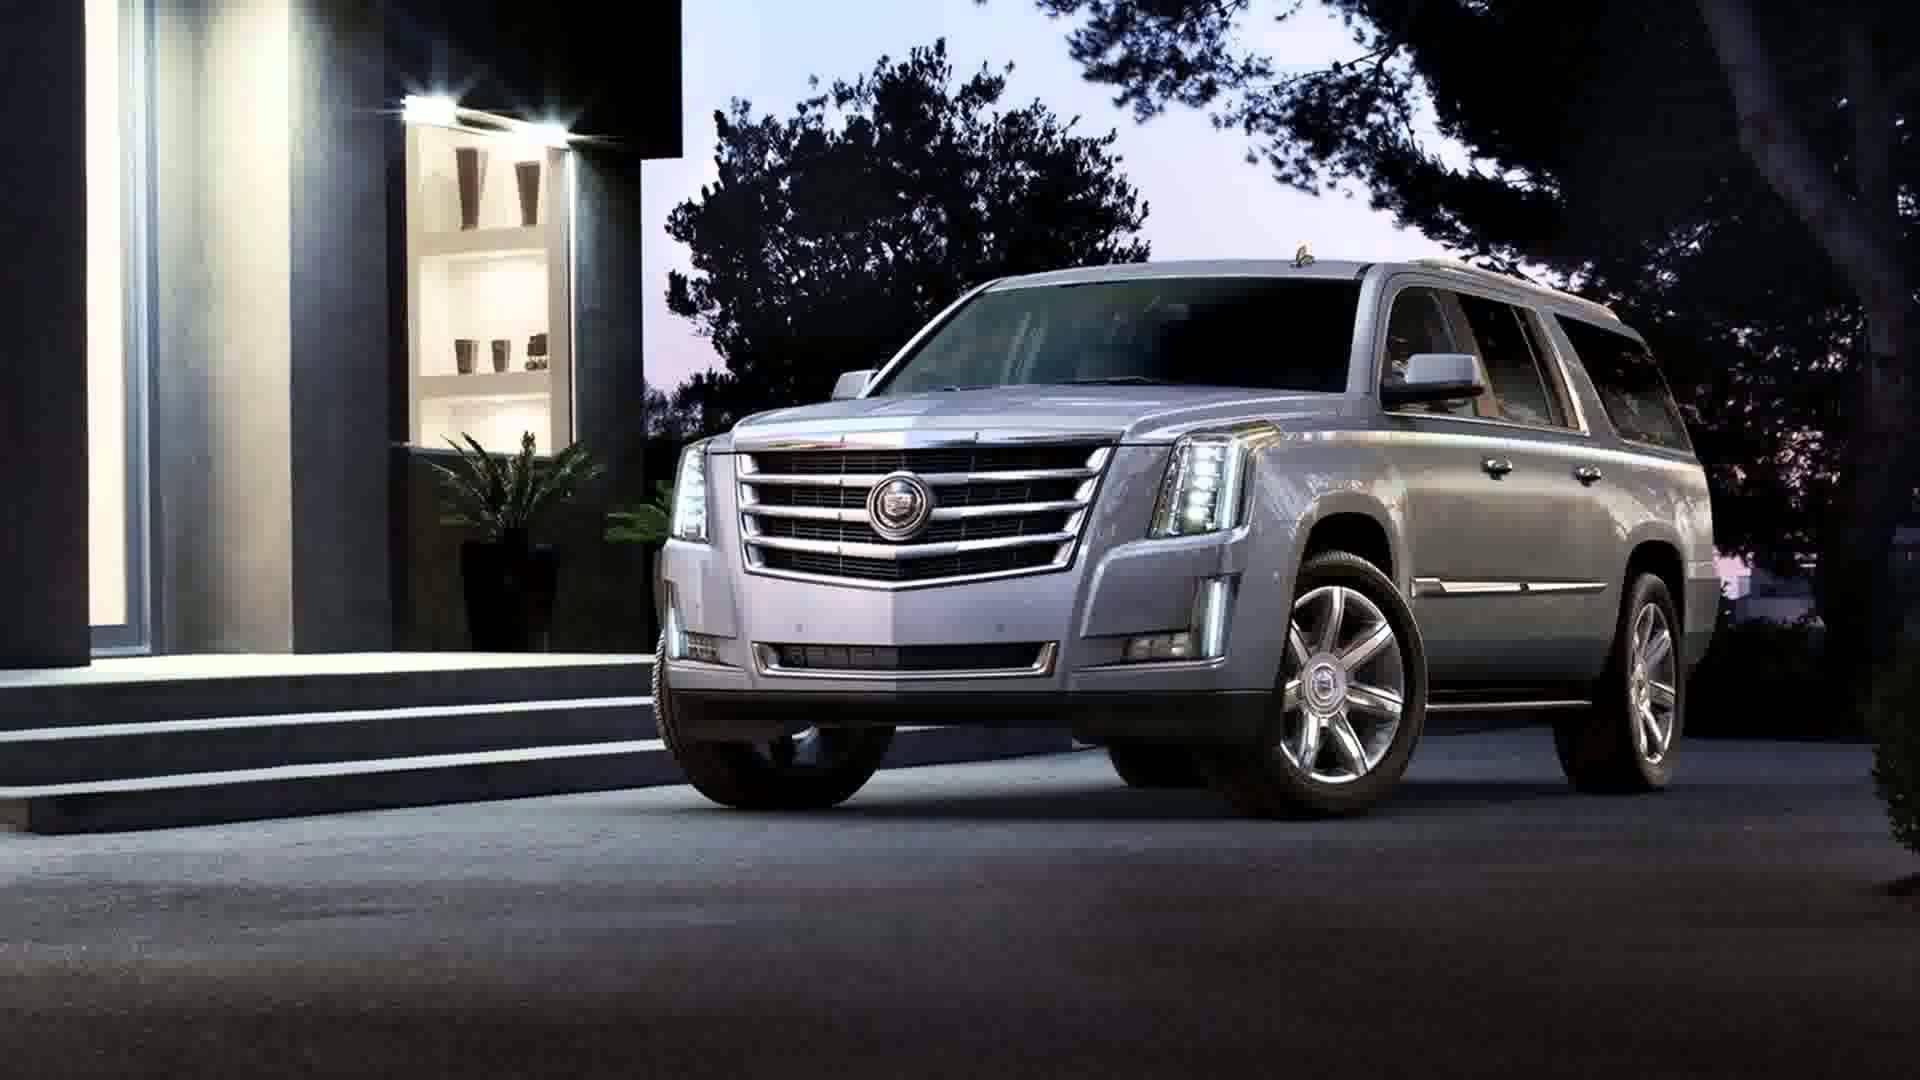 Pin On Luxury Cars Videos